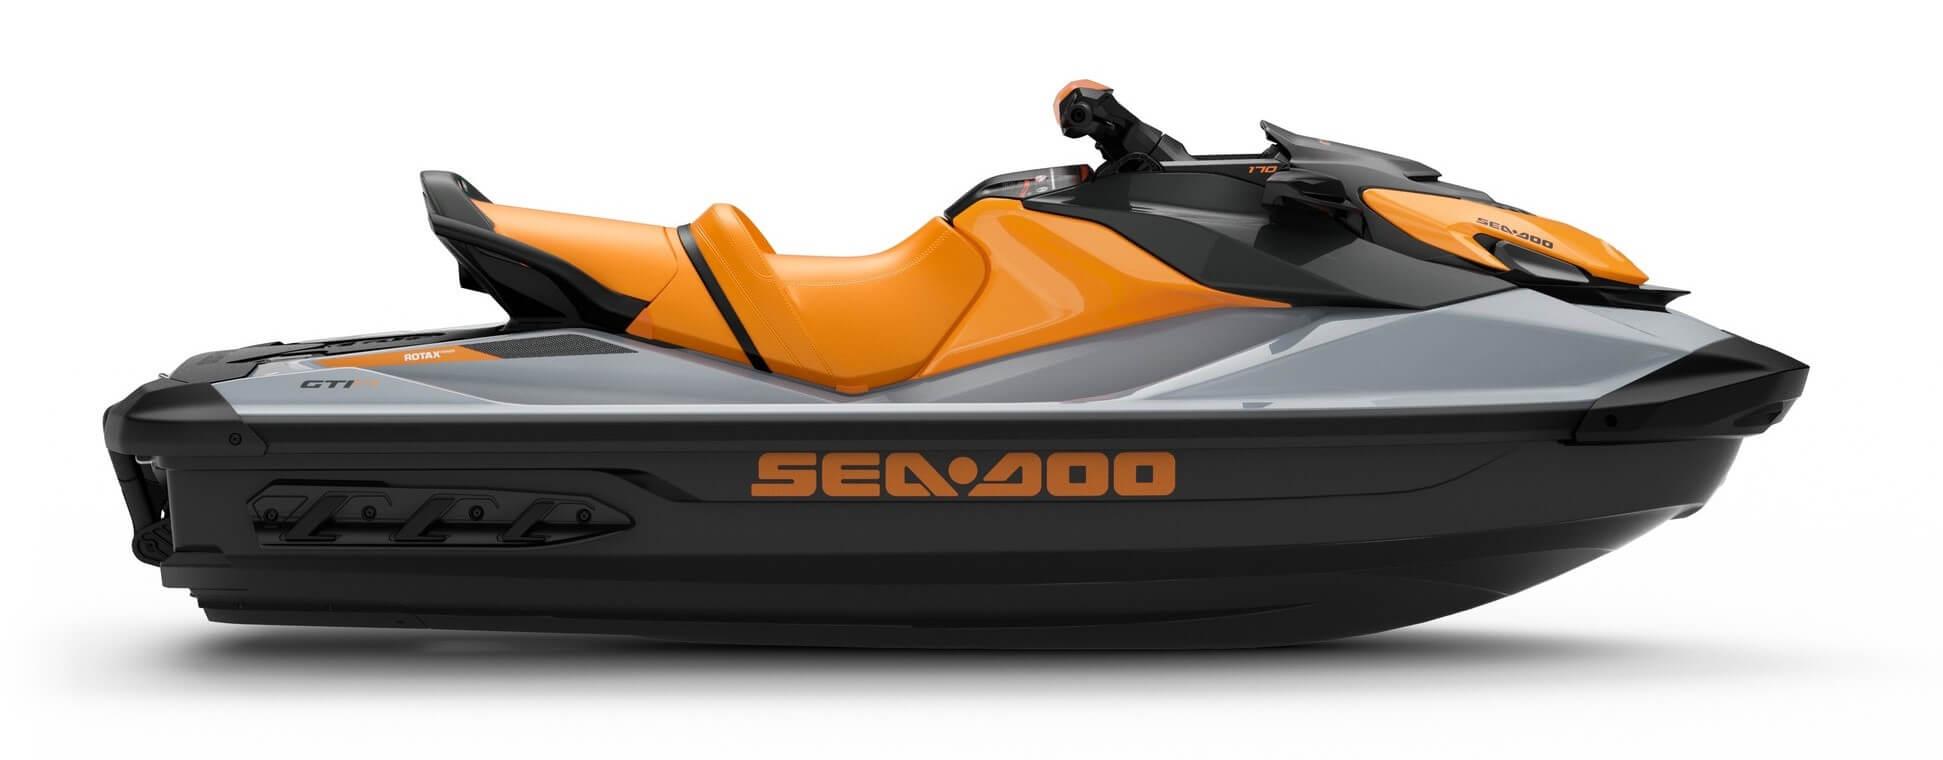 BRP Seadoo GTI SE 130